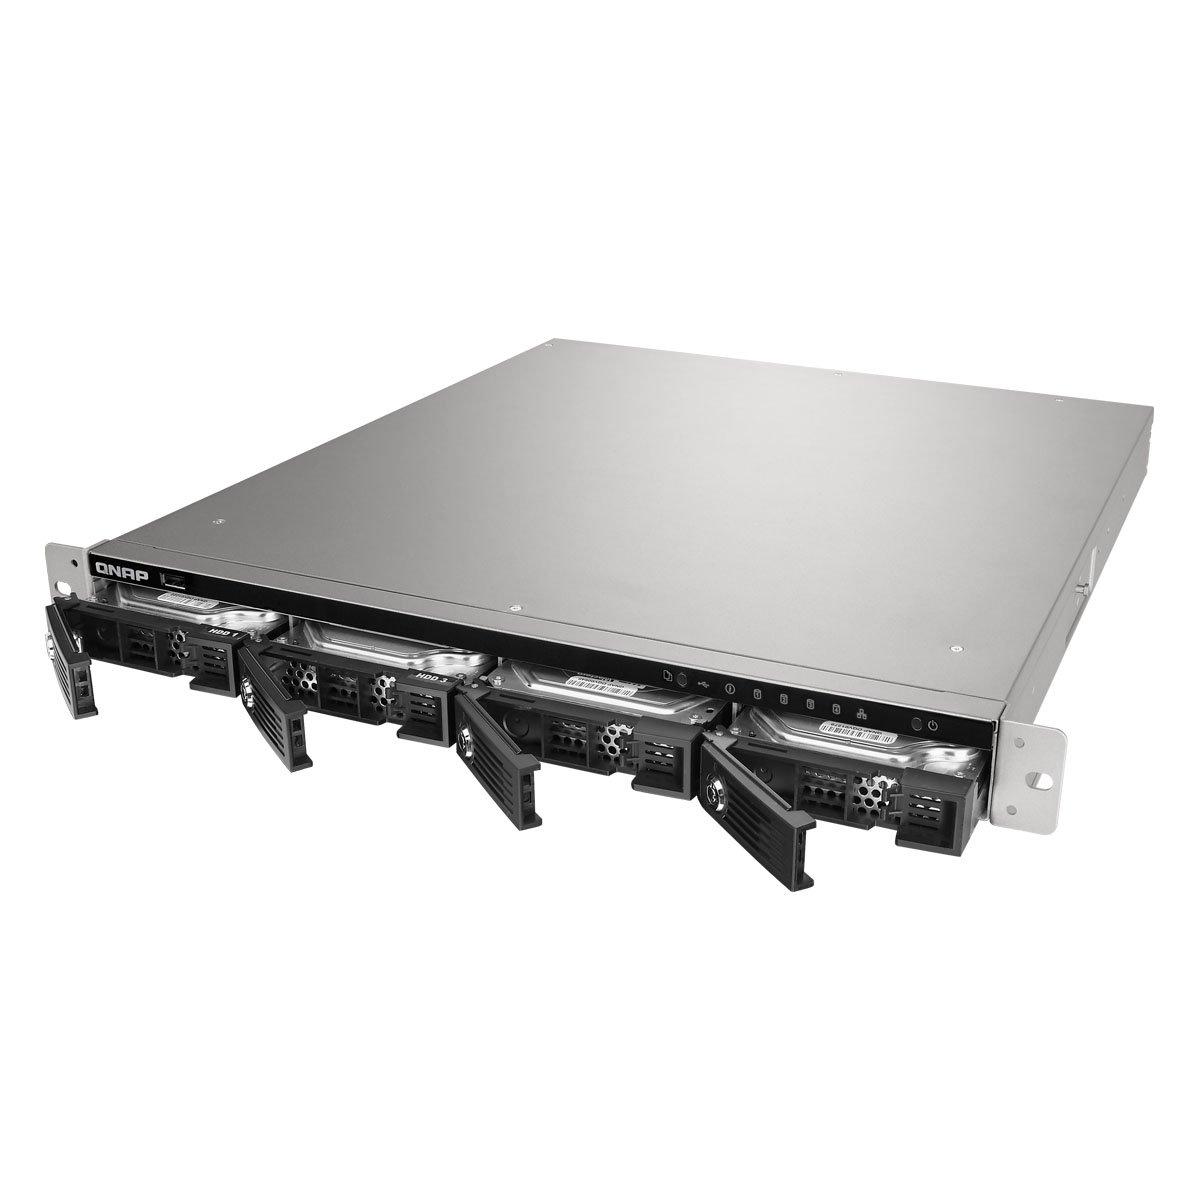 QNAP TS 453U RP 4 bay 1U iSCSI NAS, Intel 2.0GHz Quad Core CPU with 4GB RAM, 2.5''/3.5'' SATA 6Gb/s by QNAP (Image #2)